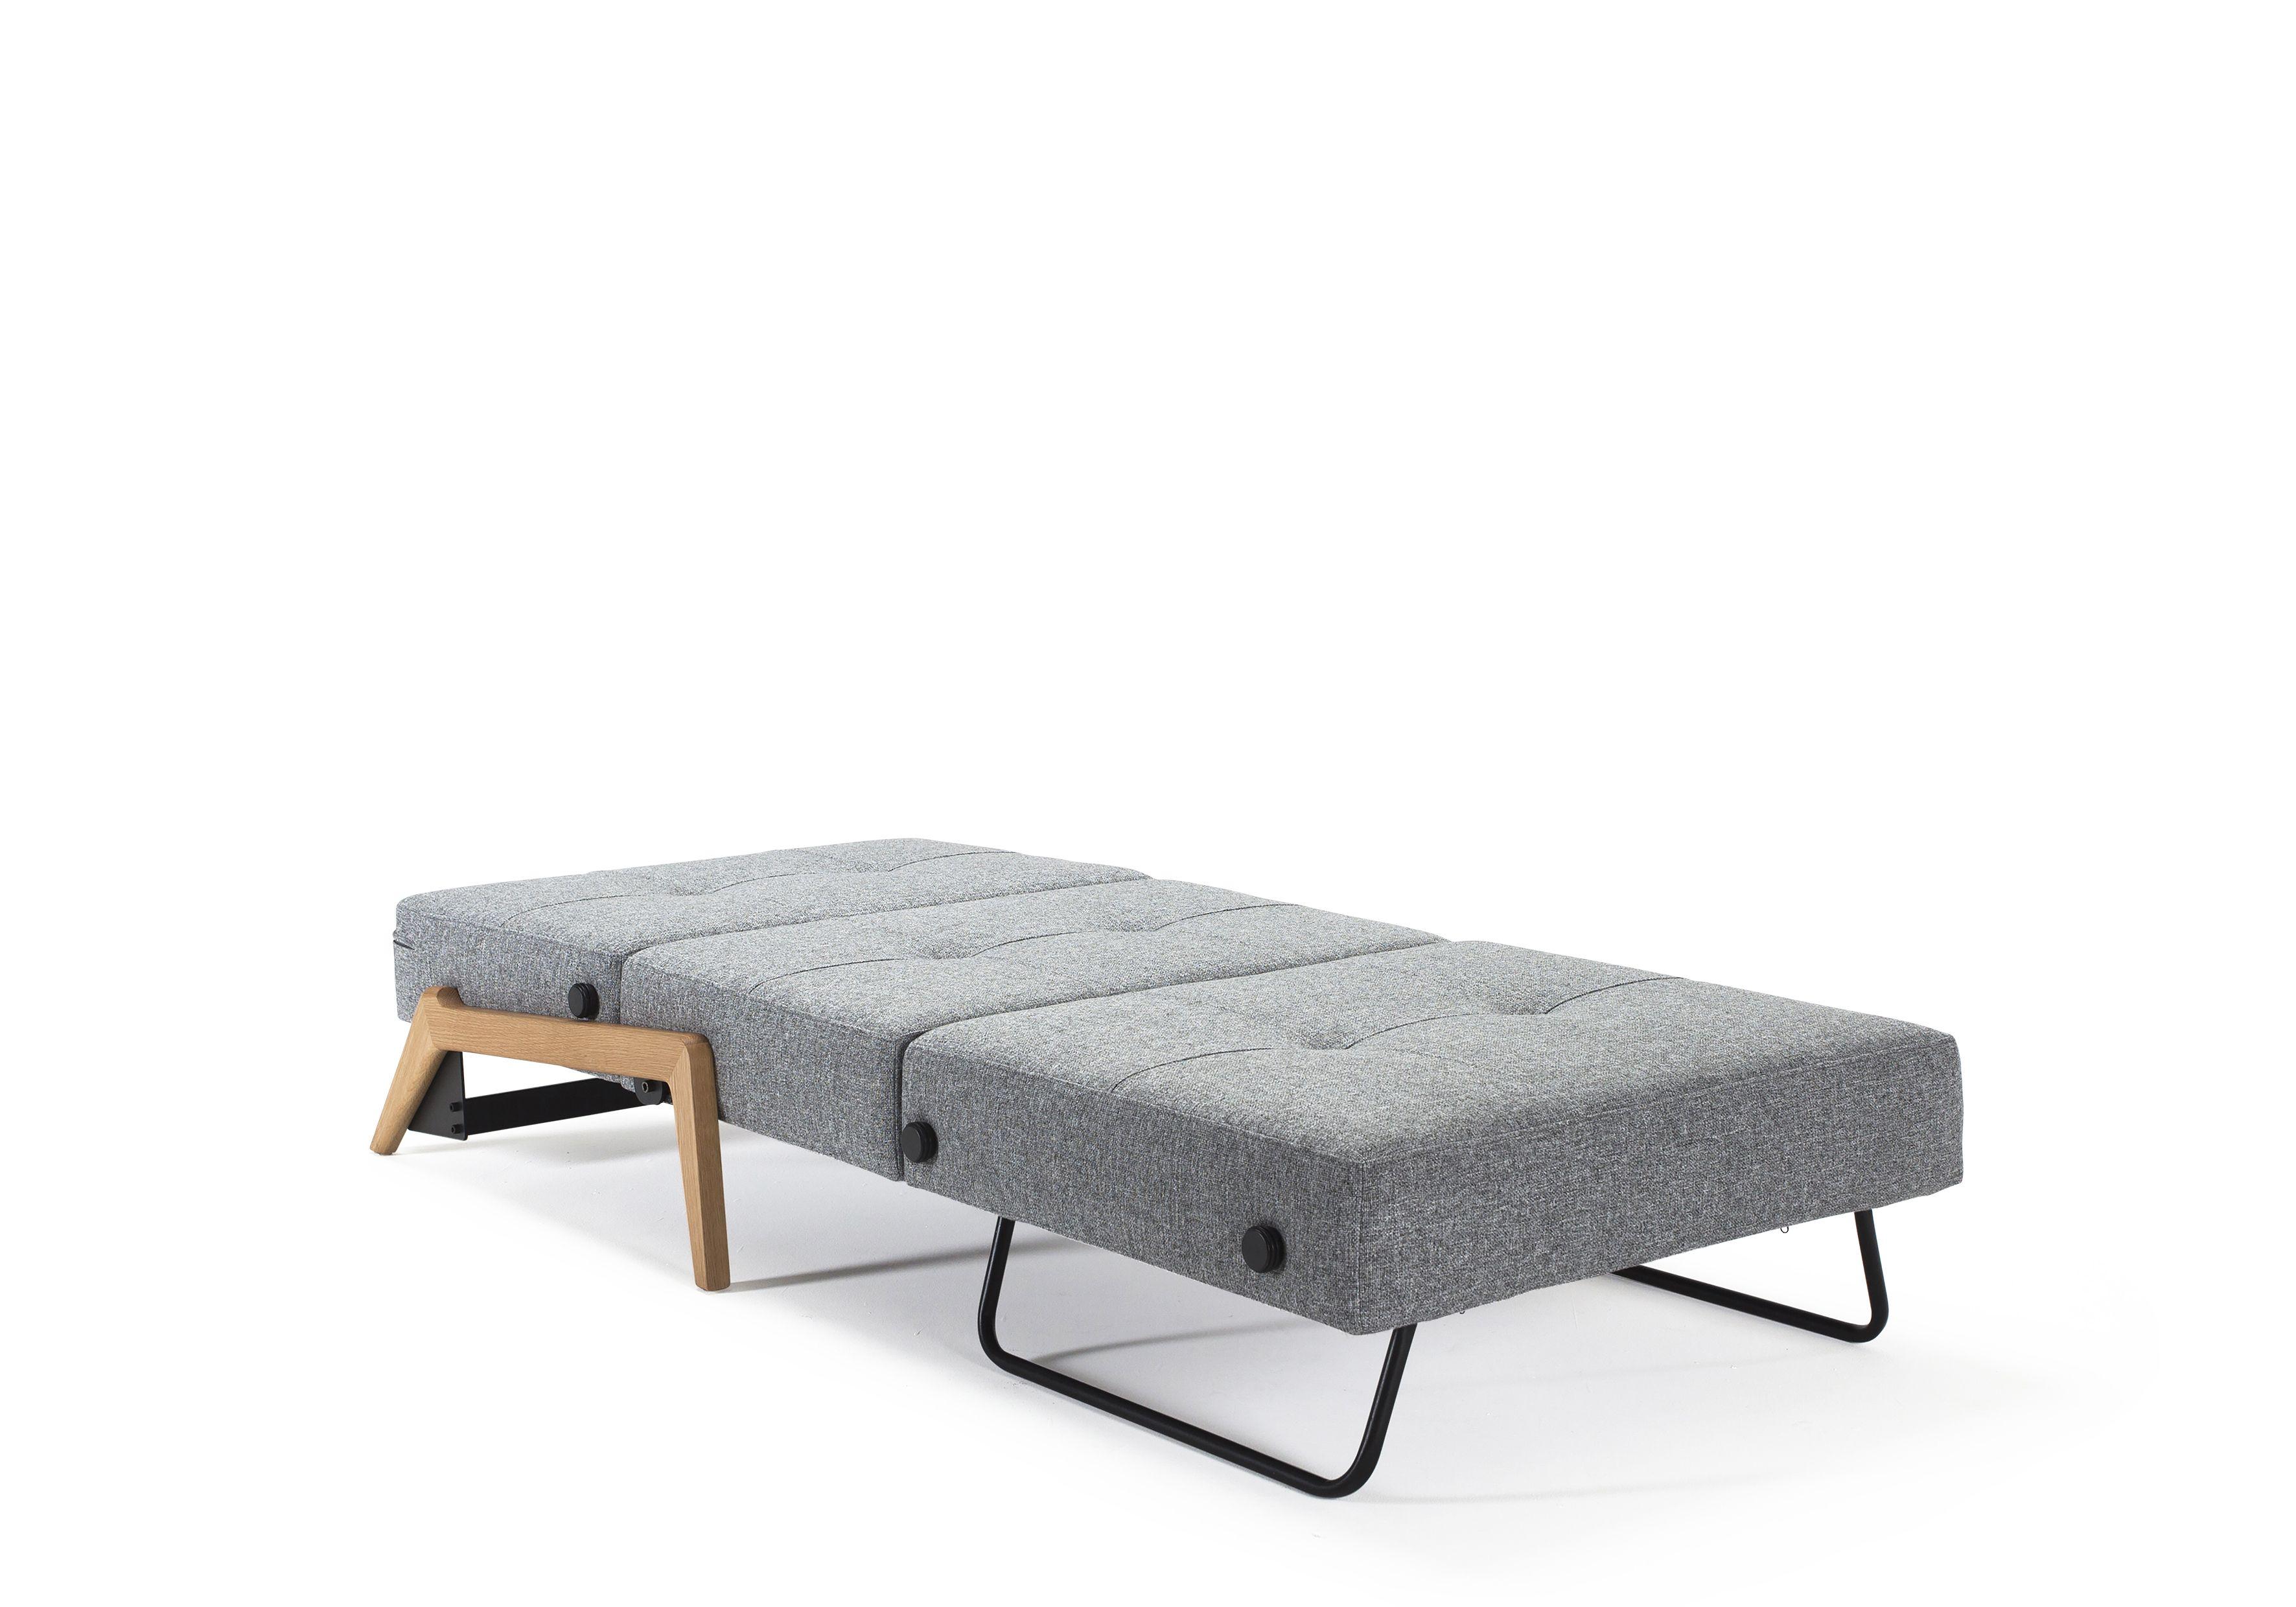 Cubed 90 With Oak Legs Sofa Bed Australia New Nordic Bag Display Wood